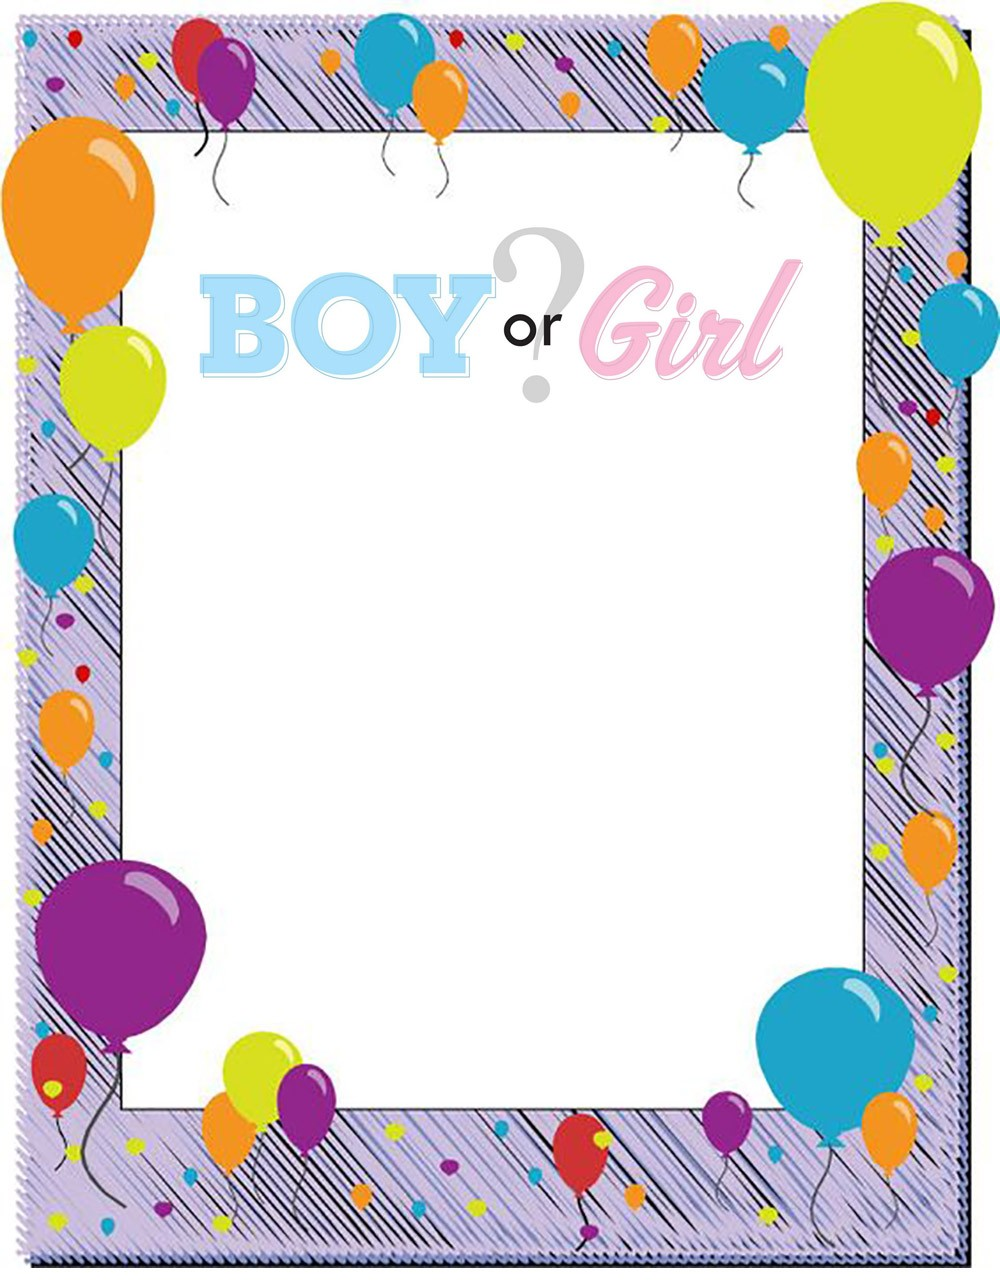 Boy or Girl Invitation Template